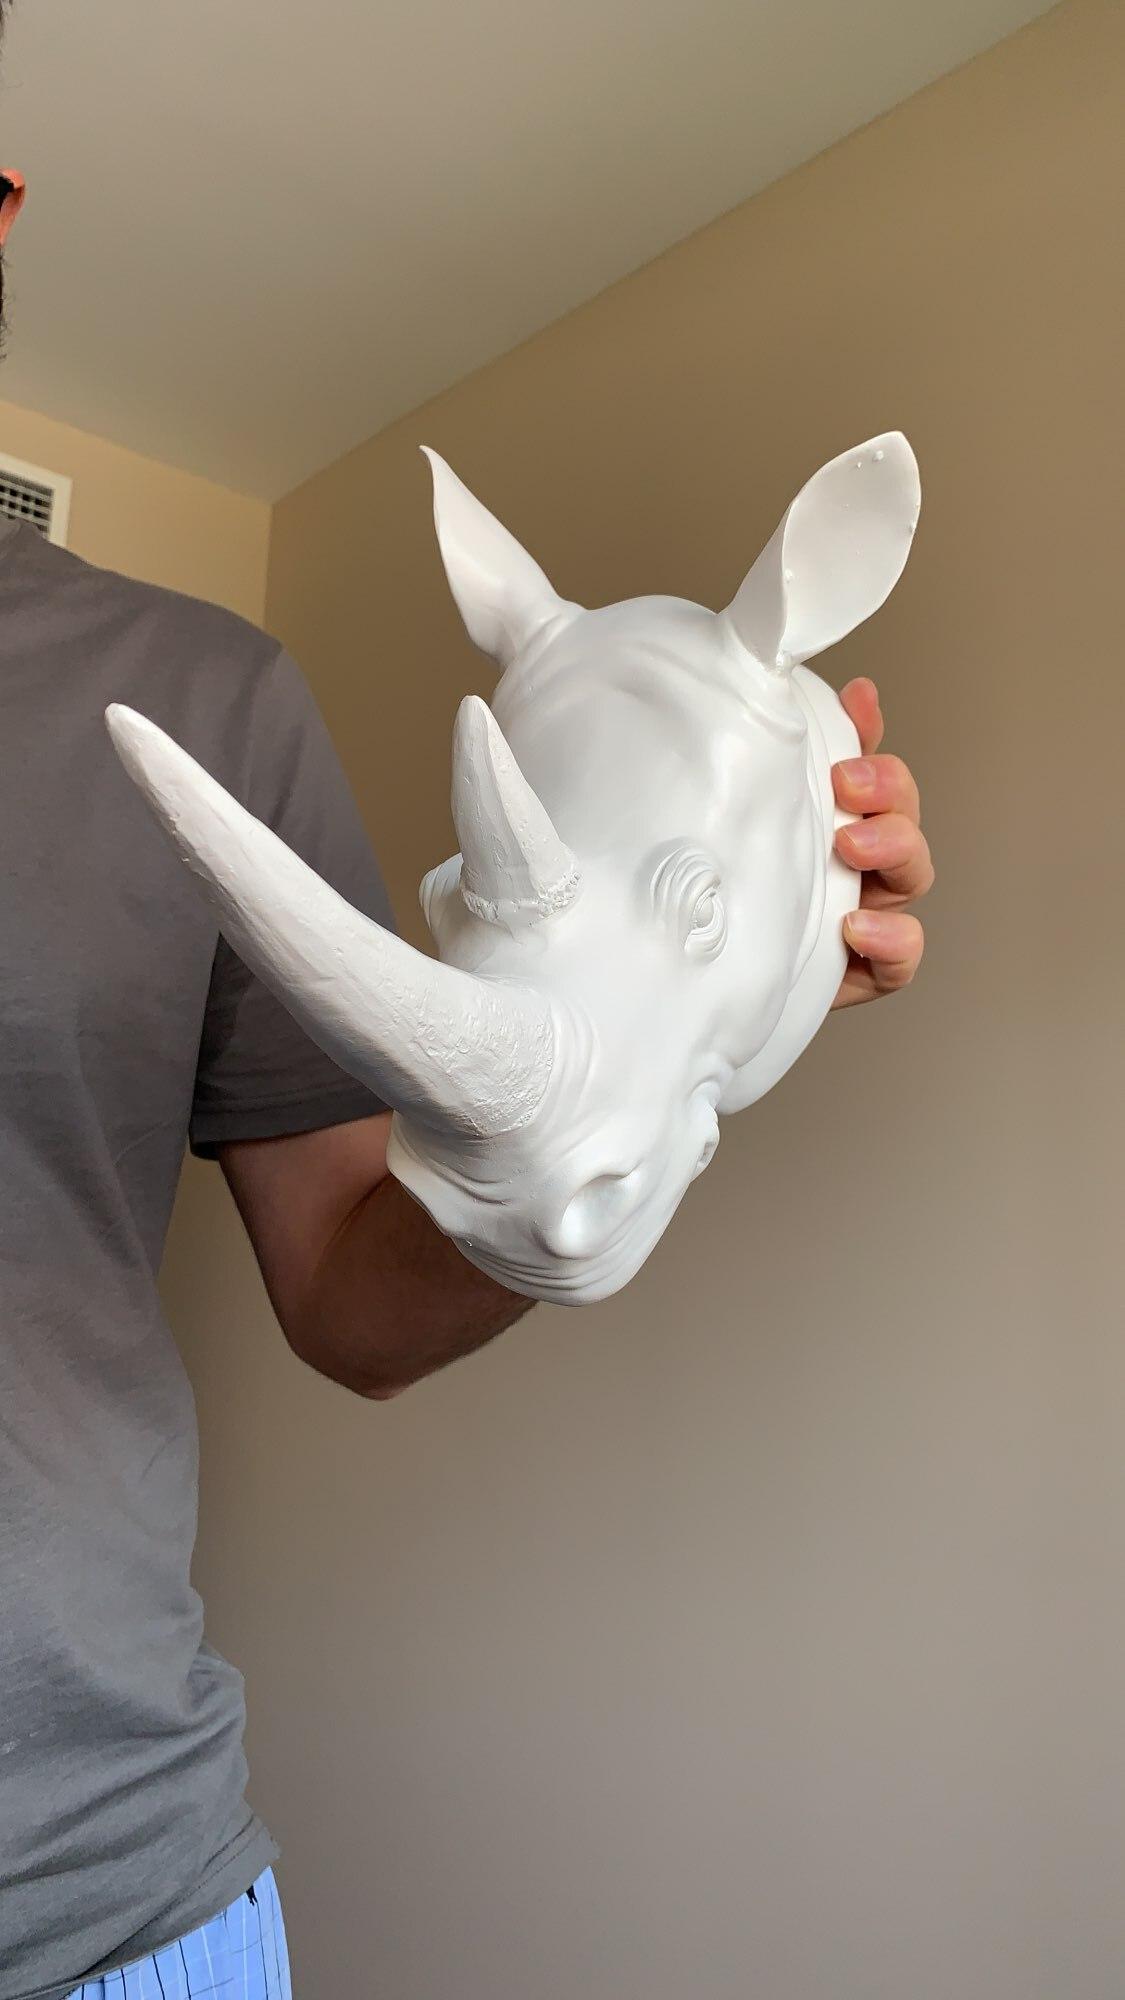 White Resin Rhinoceros Head Ornament photo review